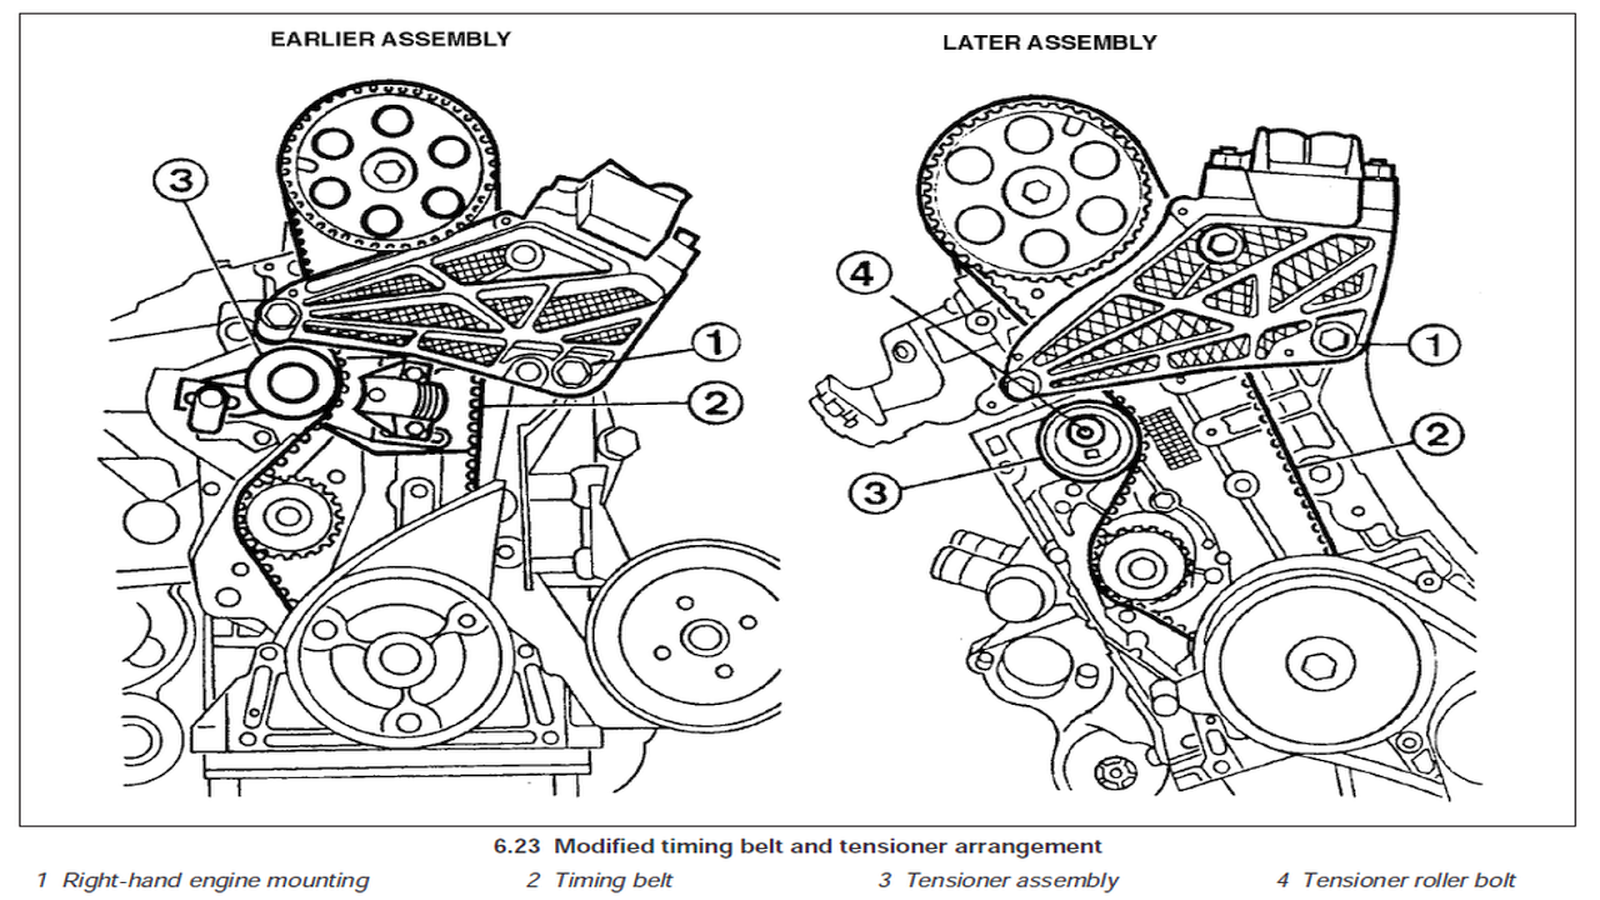 citroen berlingo 1.6 hdi engine wiring diagram